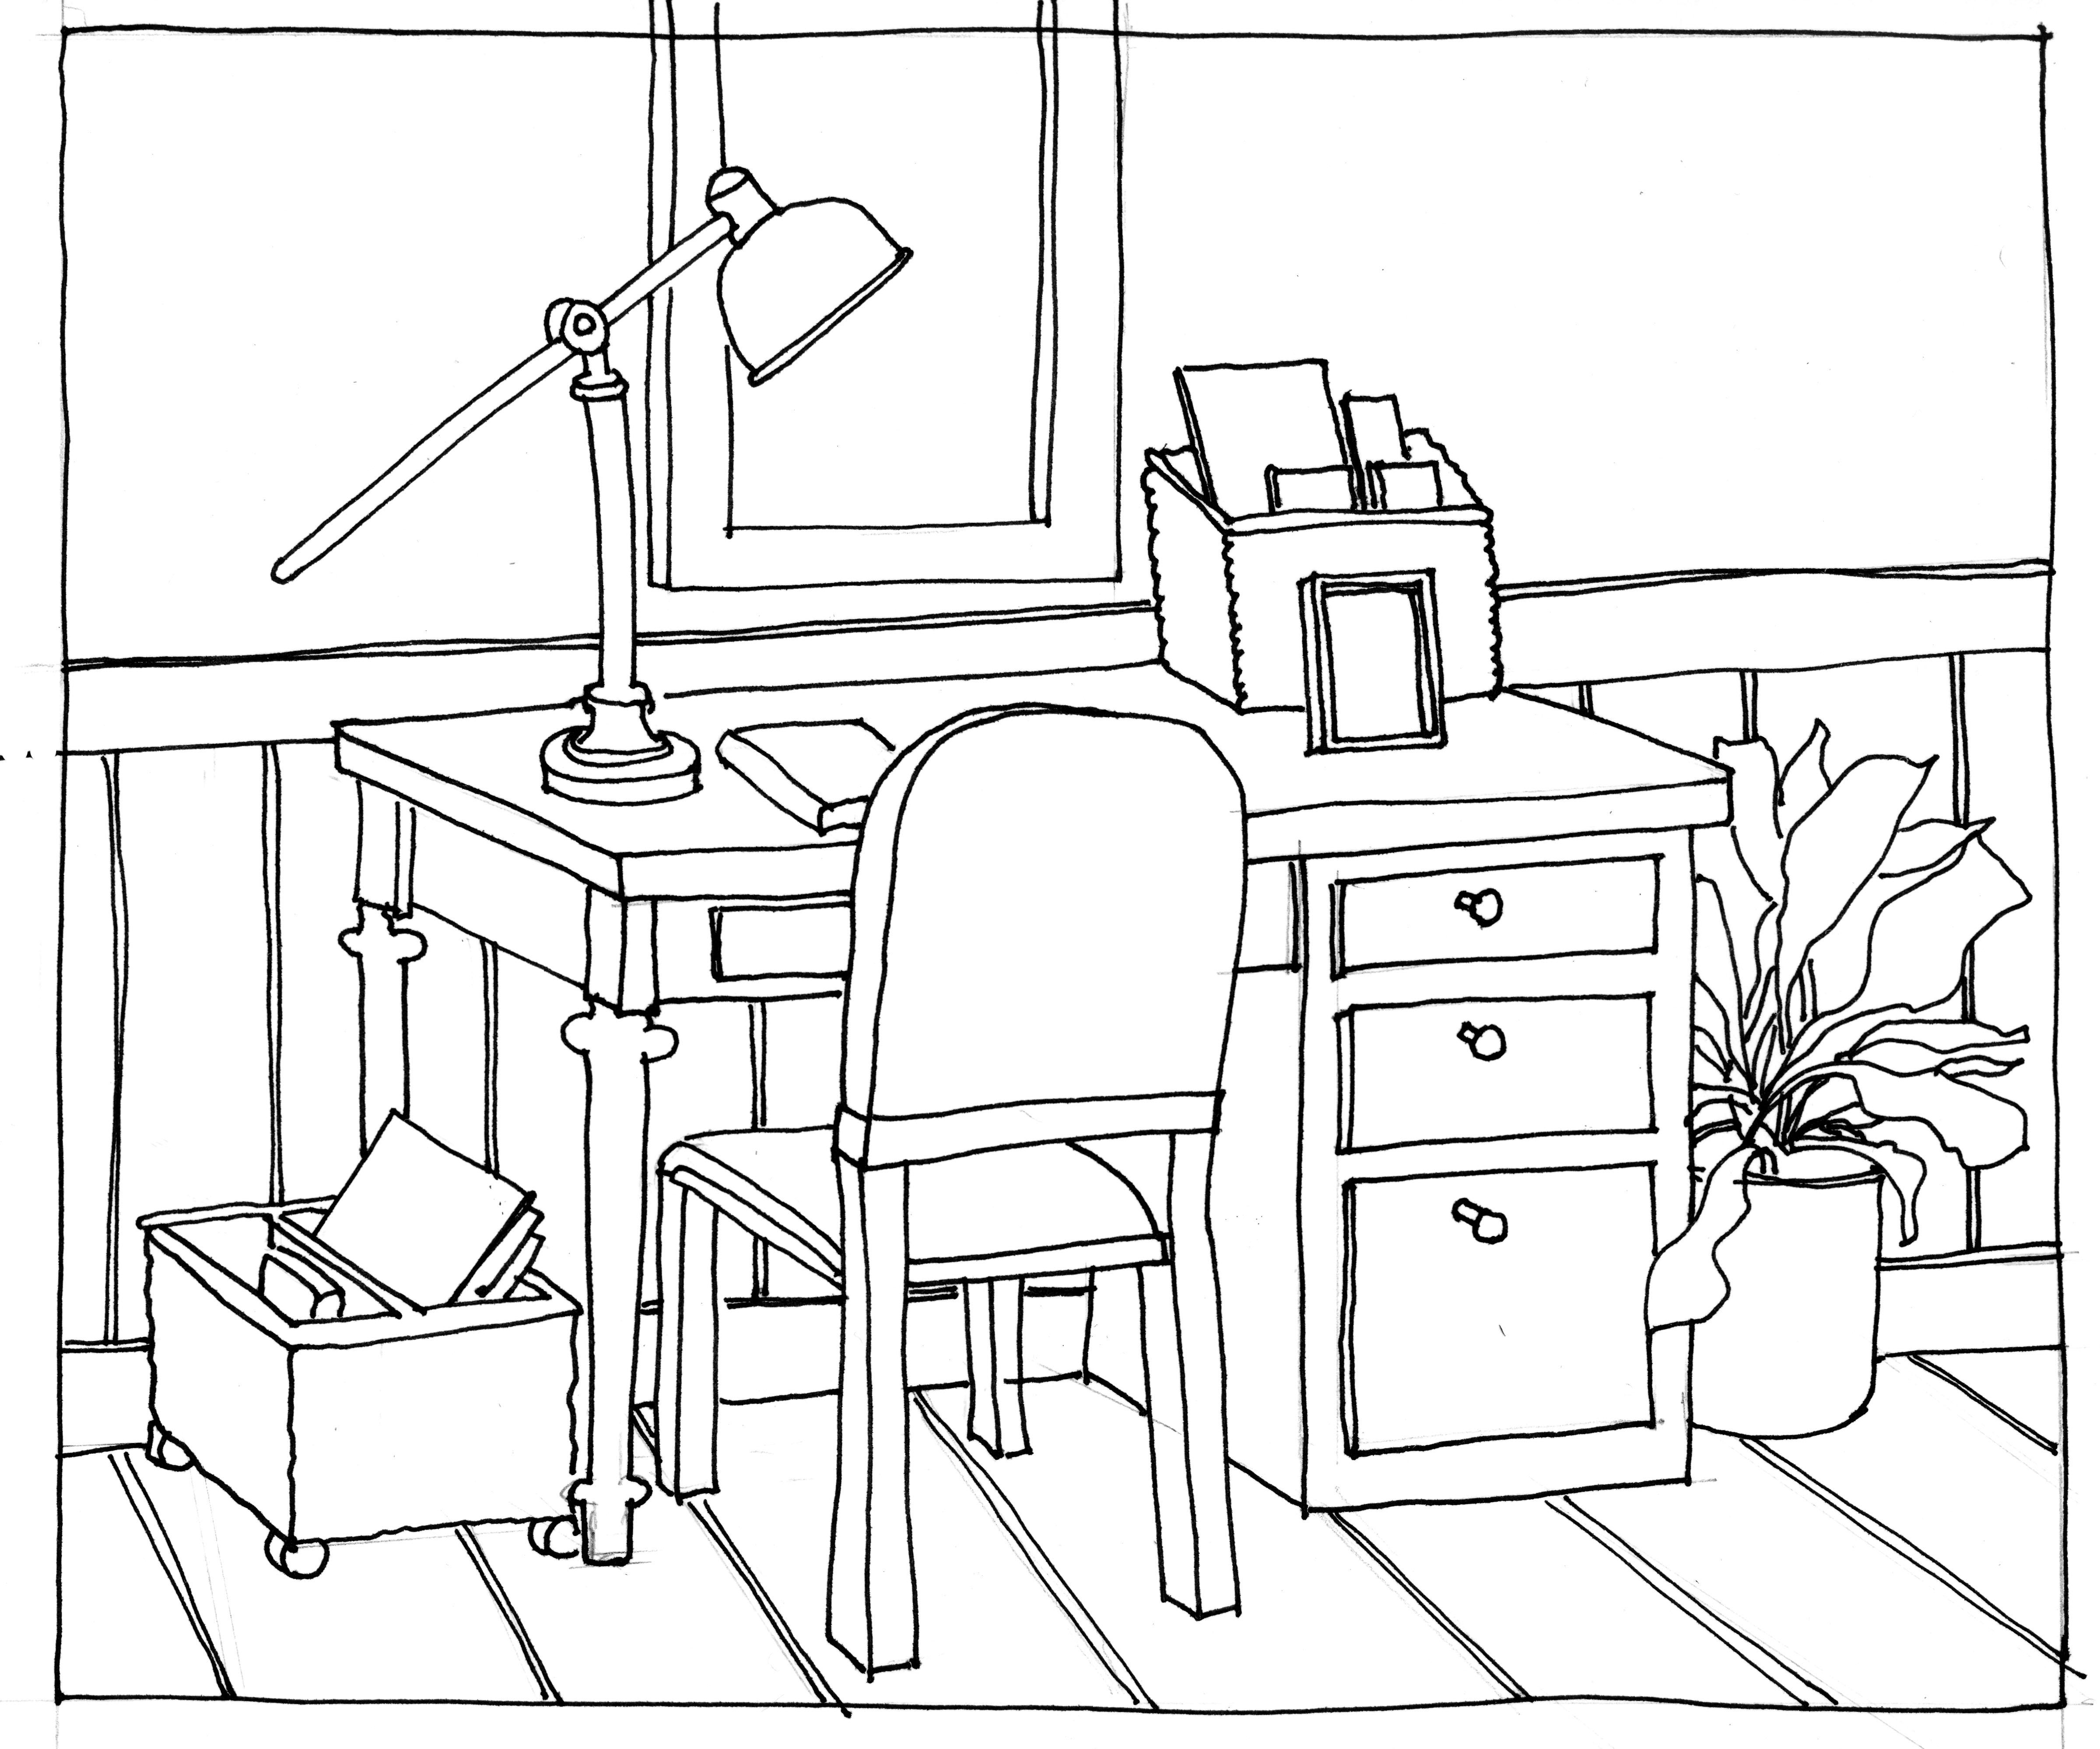 4799x3997 Drawing Of Chair Jaguar Xj6 Wiring Diagram